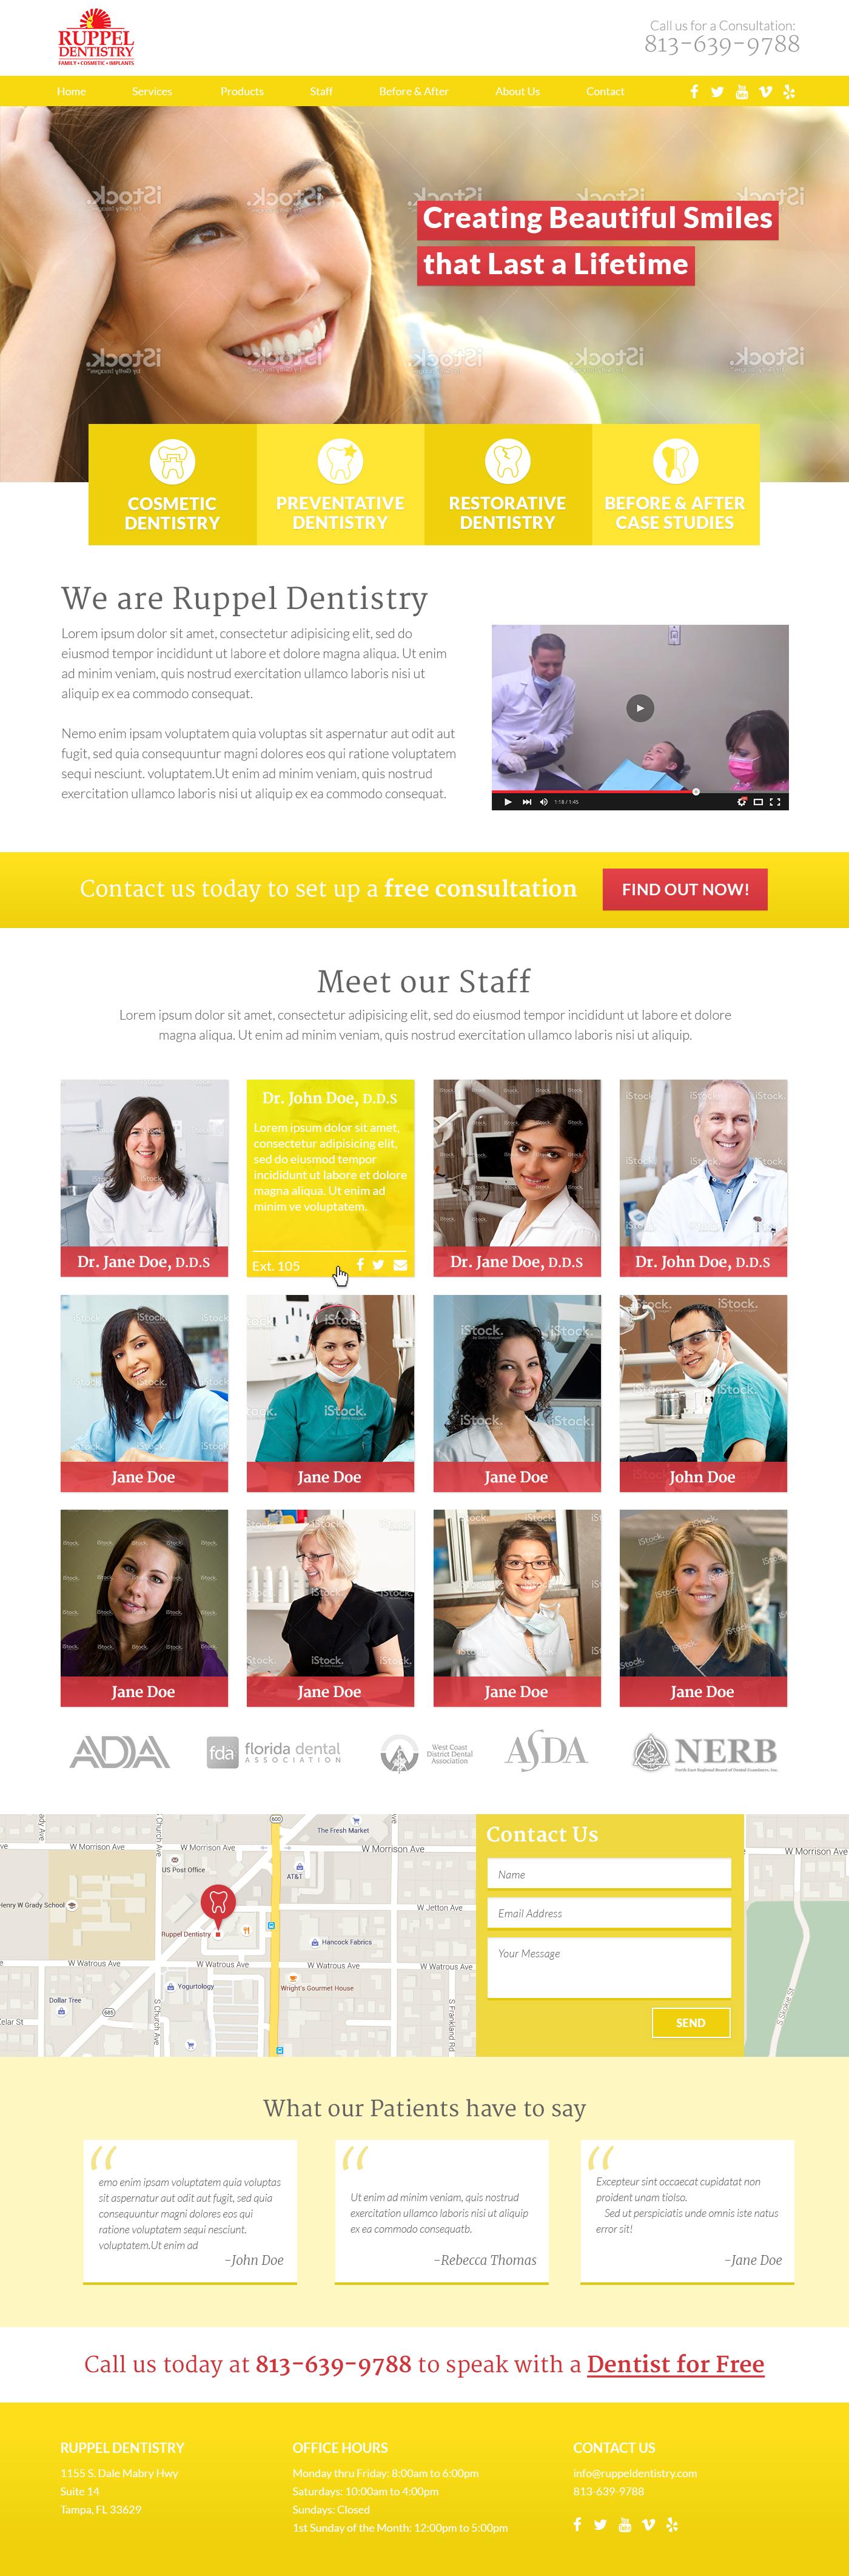 Ruppel Dentistry Homepage Design